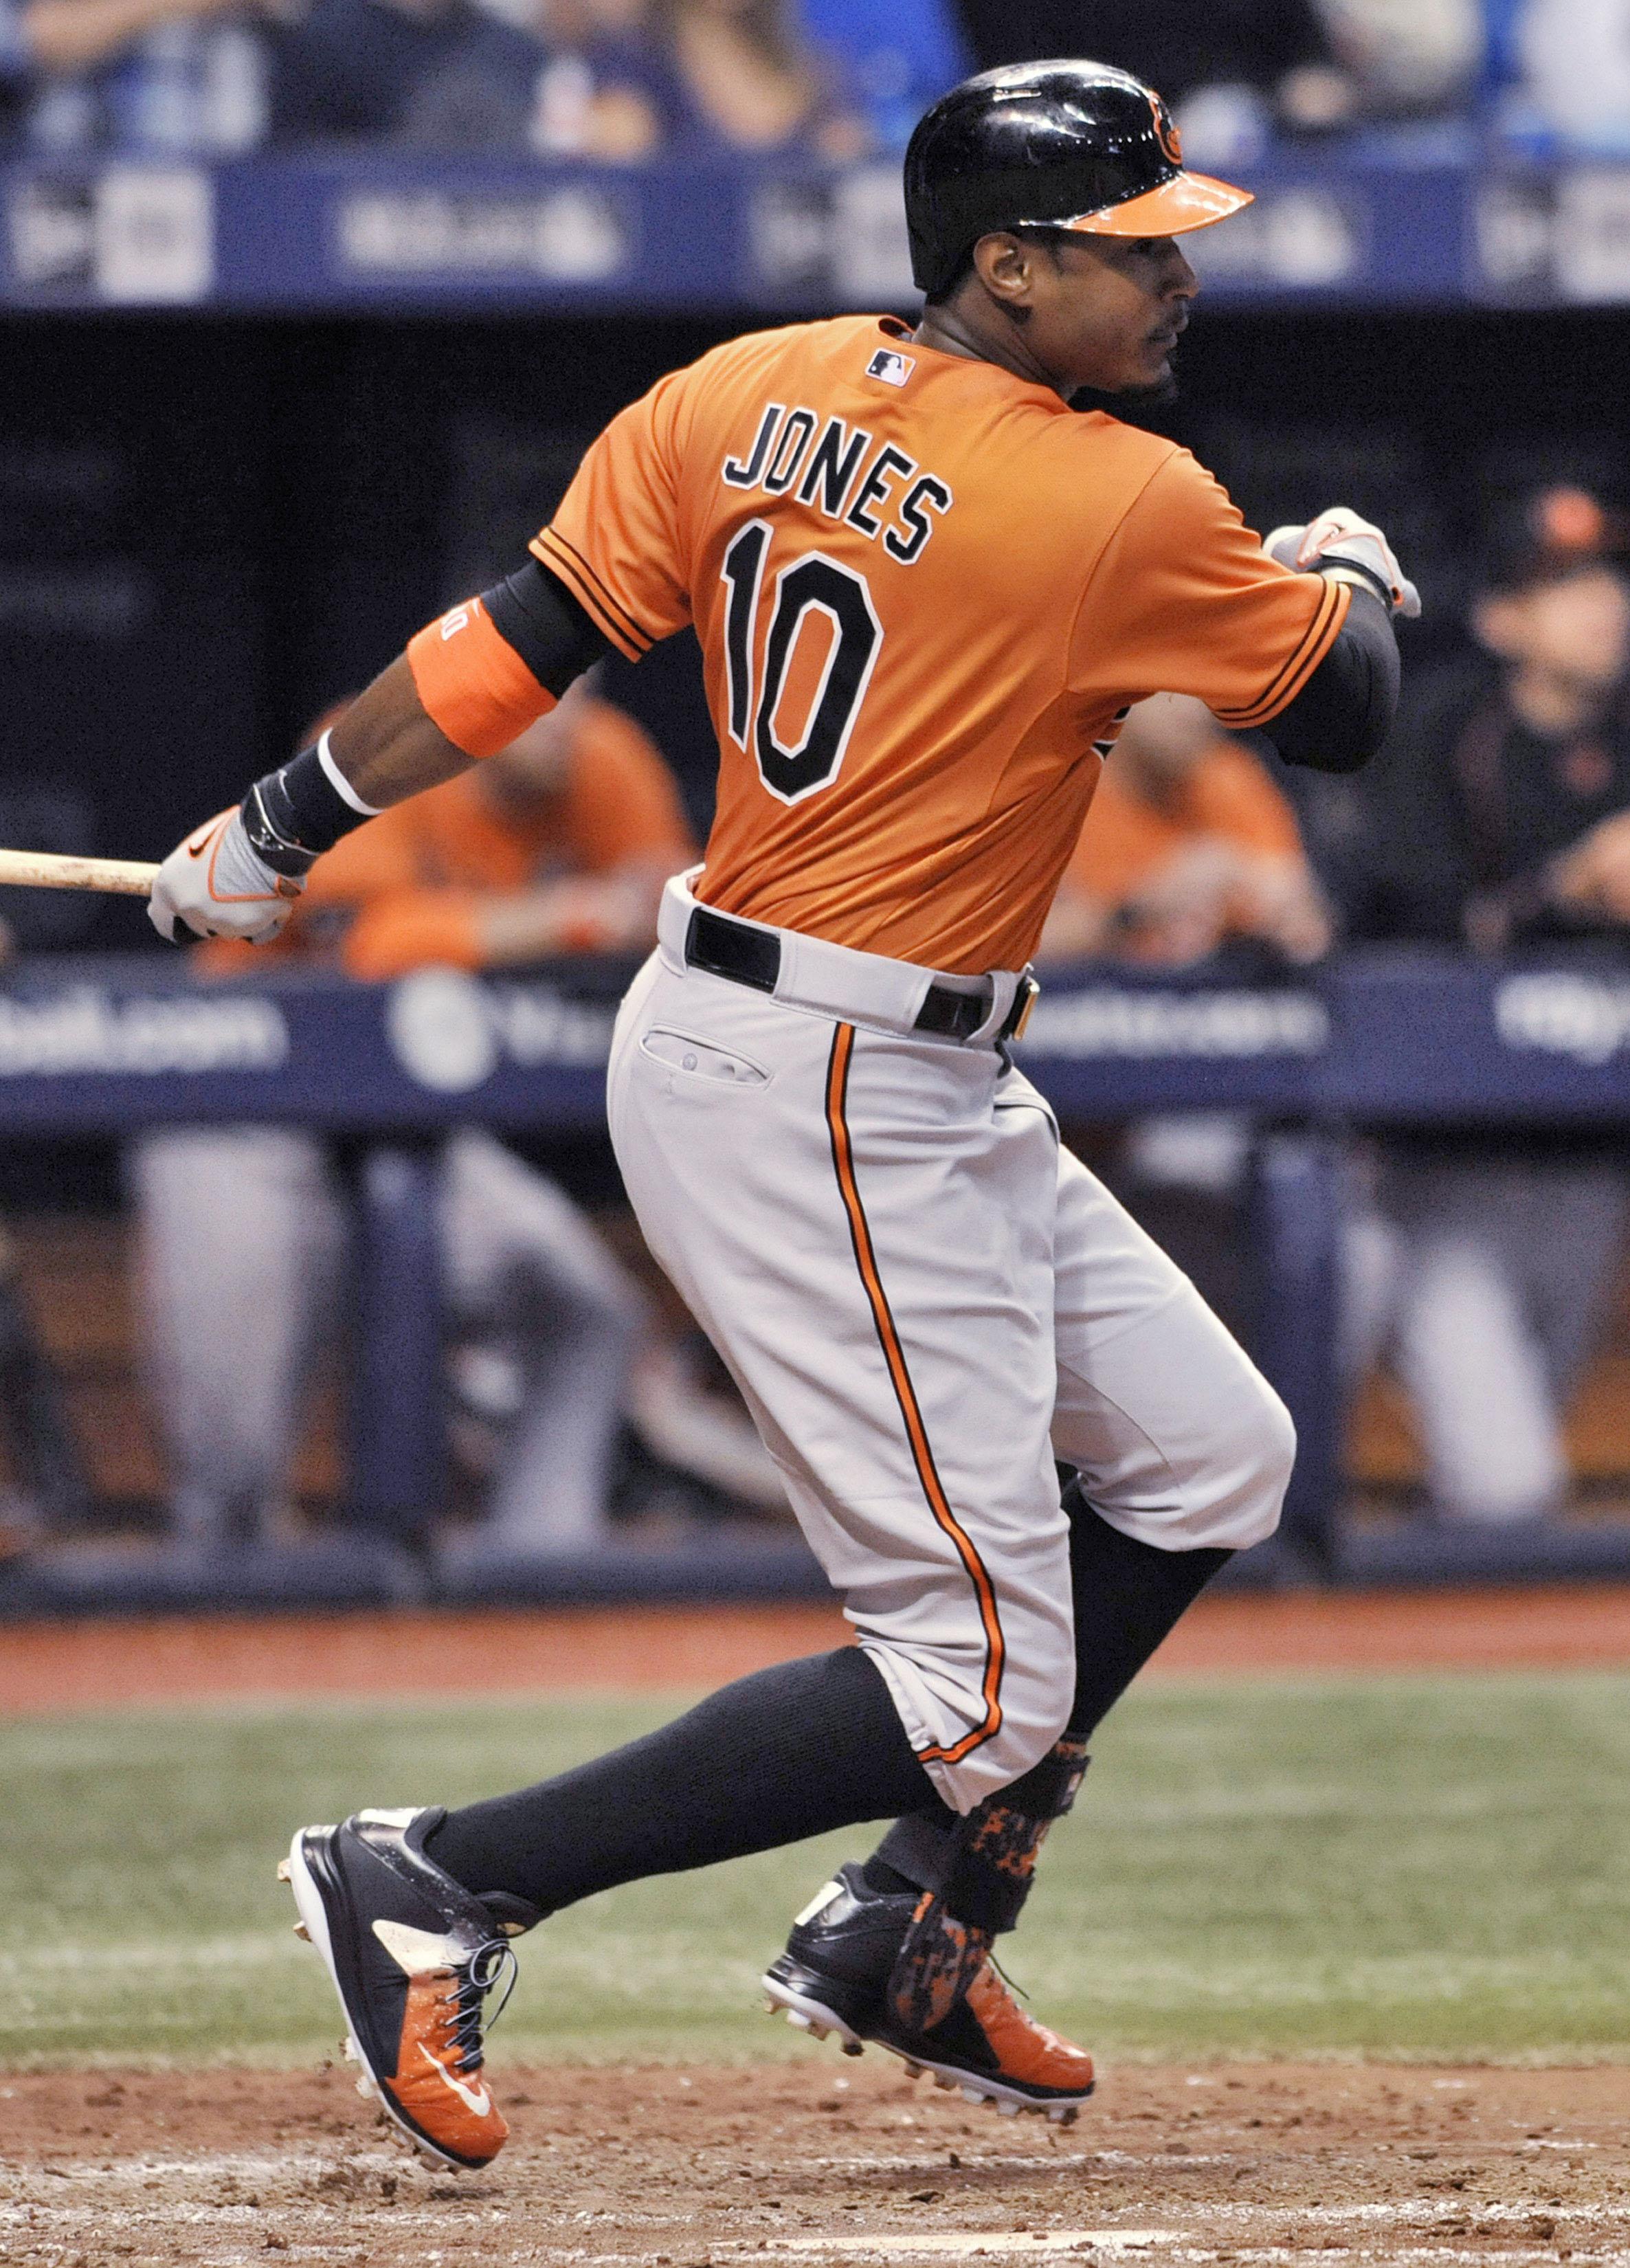 Baltimore Orioles' Adam Jones hits an RBI-single off Tampa Bay Rays' Erasmo Ramirez during the sixth inning of a baseball game Saturday, Sept. 19, 2015, in St. Petersburg, Fla. (AP Photo/Steve Nesius)